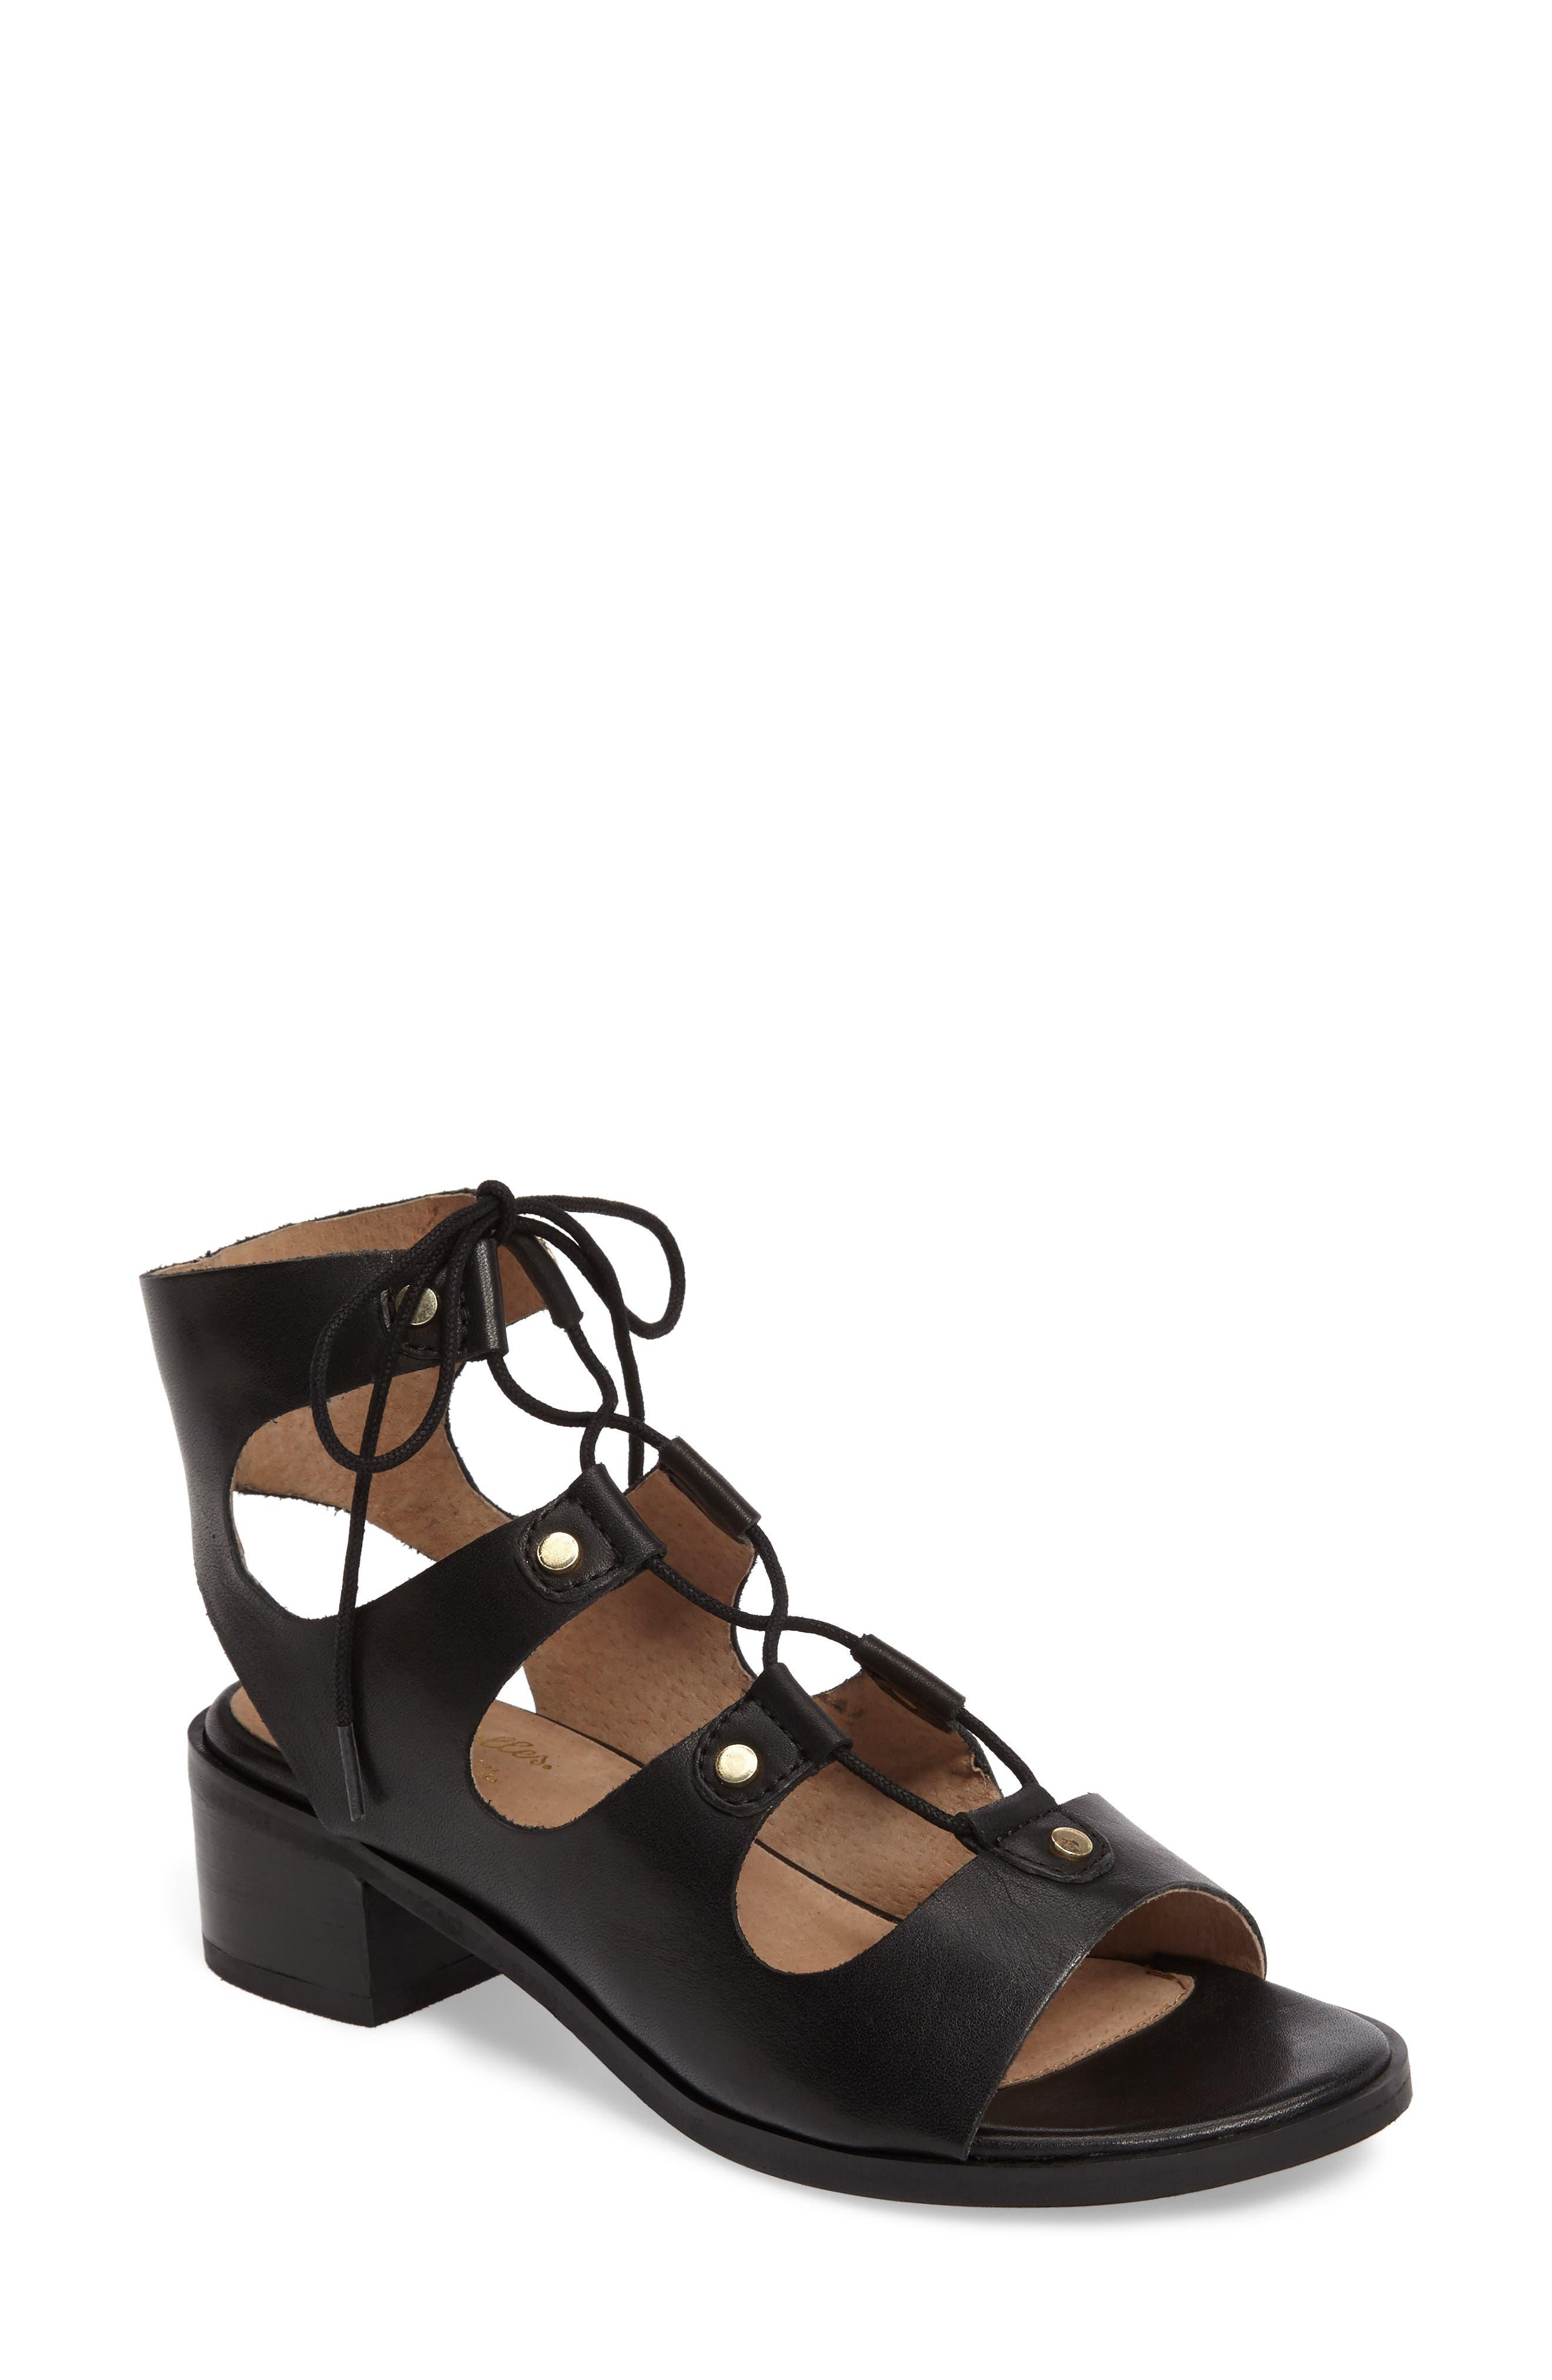 Alternate Image 1 Selected - Seychelles Love Affair Lace-Up Sandal (Women)